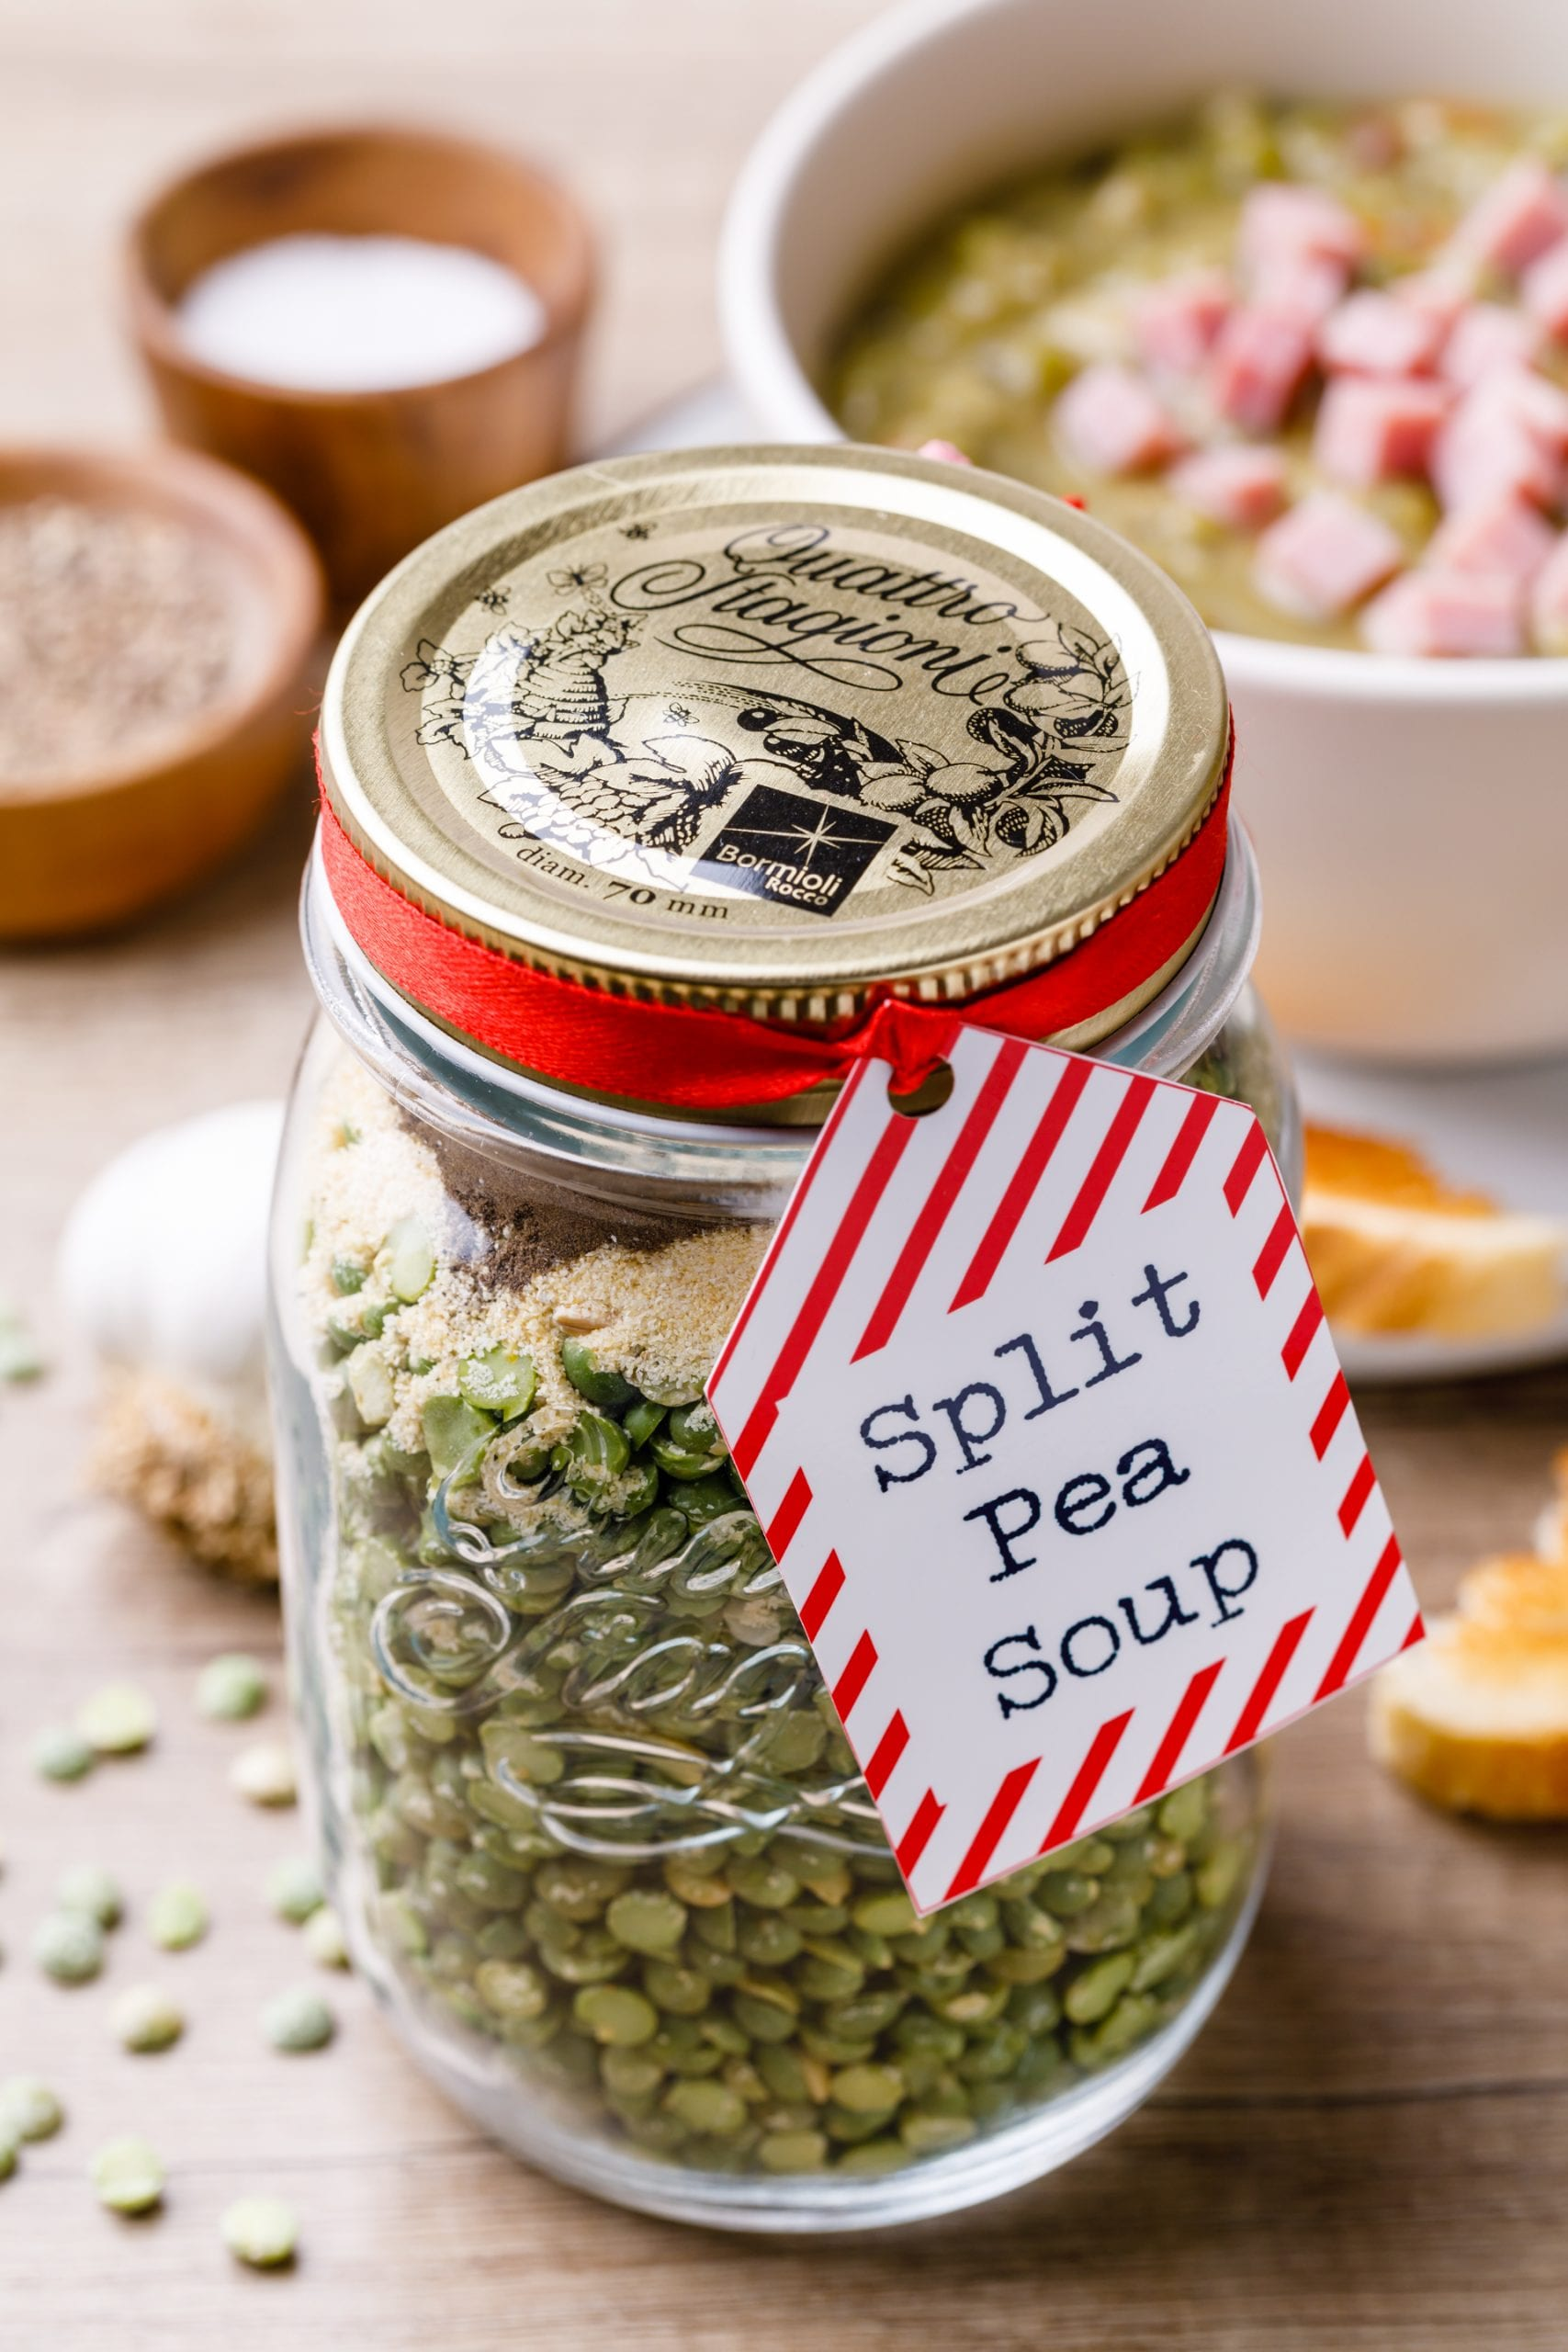 Split Pea Soup Mix Recipe In A Jar